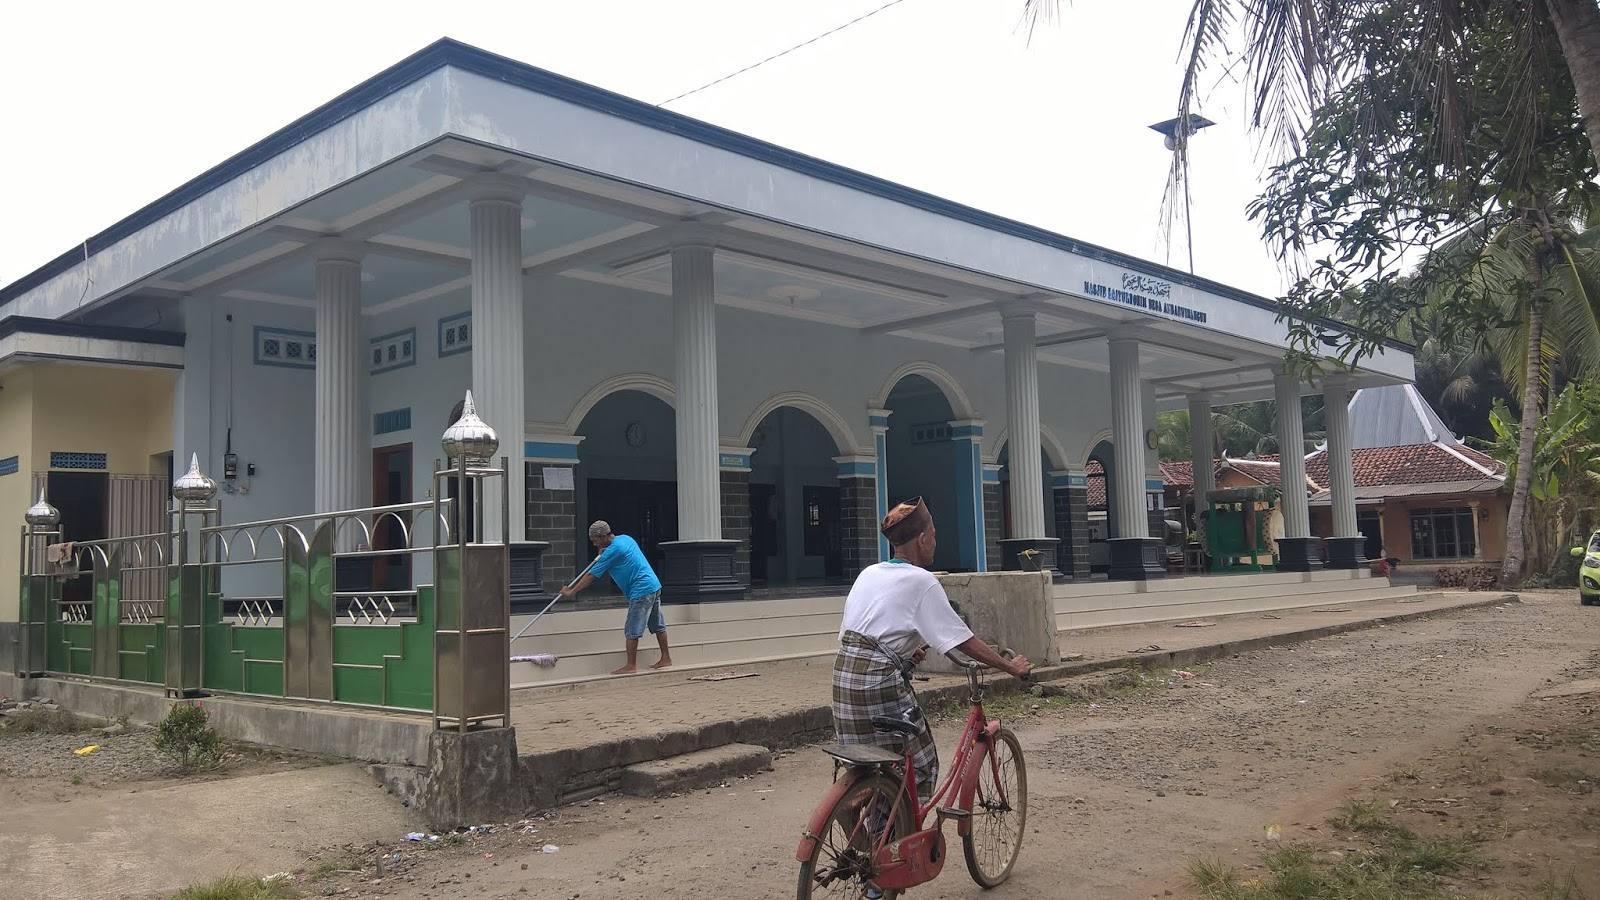 Masjid Baiturrohim Desa Ambarwinangun